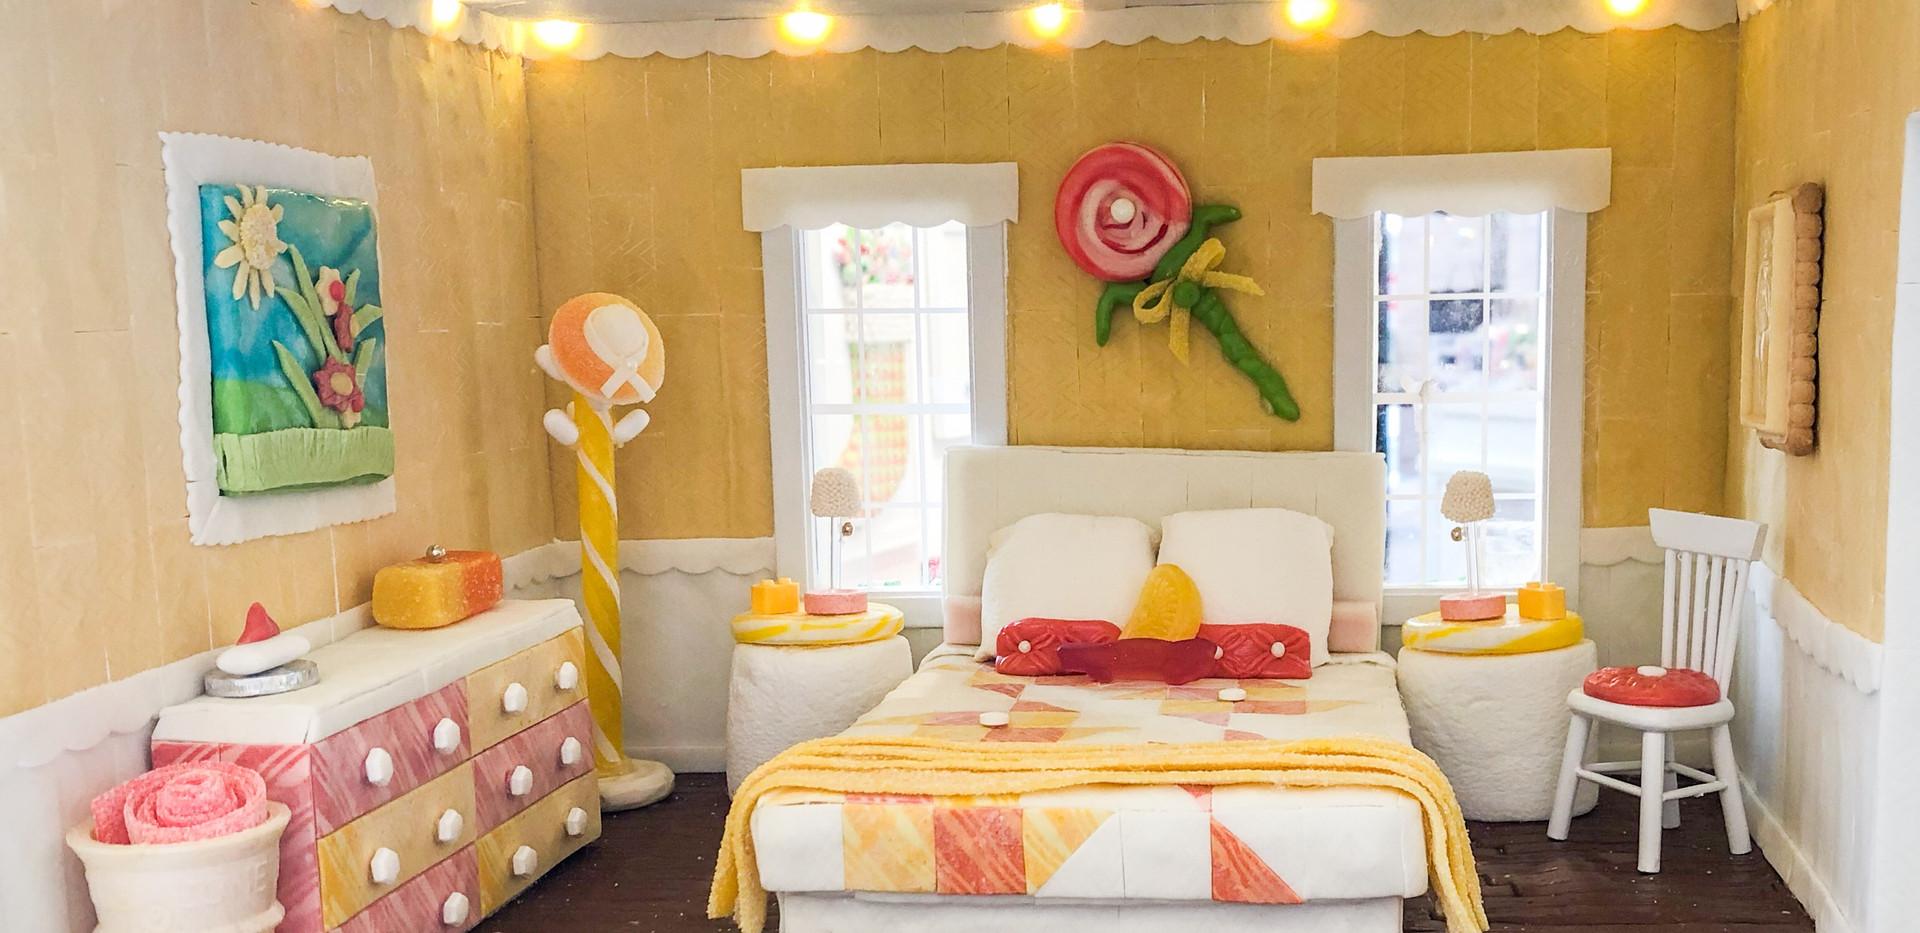 Master Bedroom, Gum Quilt, Tootsie Roll Art on Wall